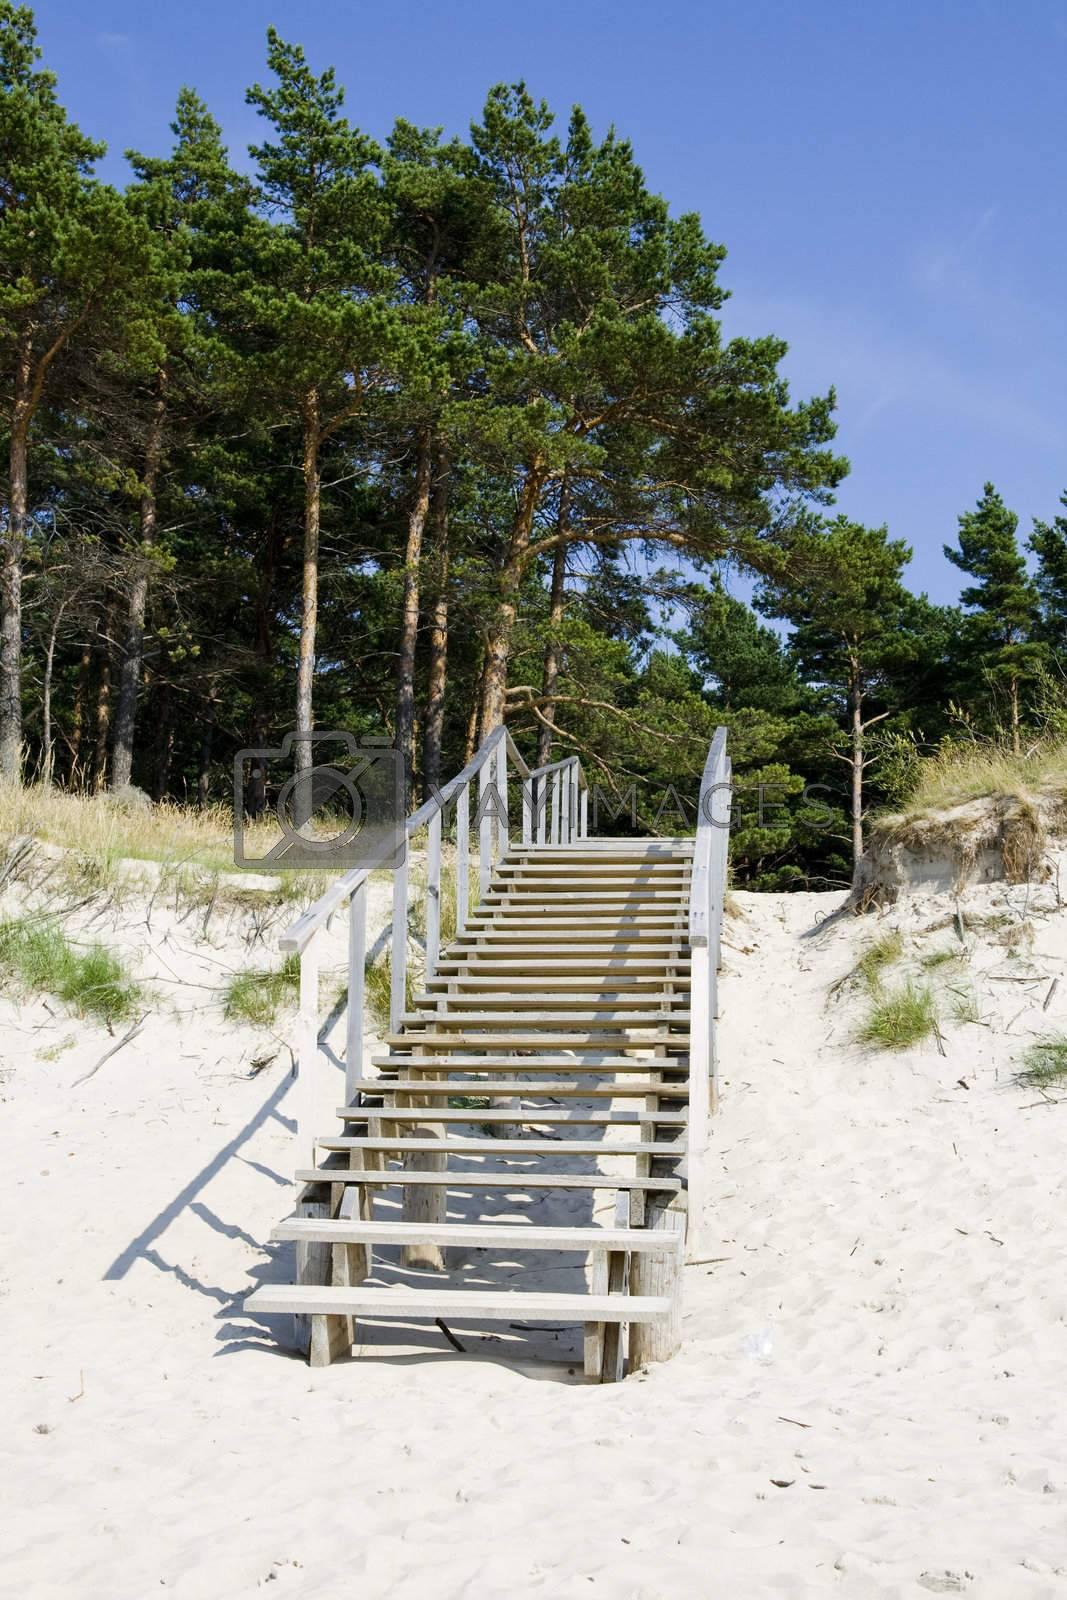 Stairway in the beach in summer